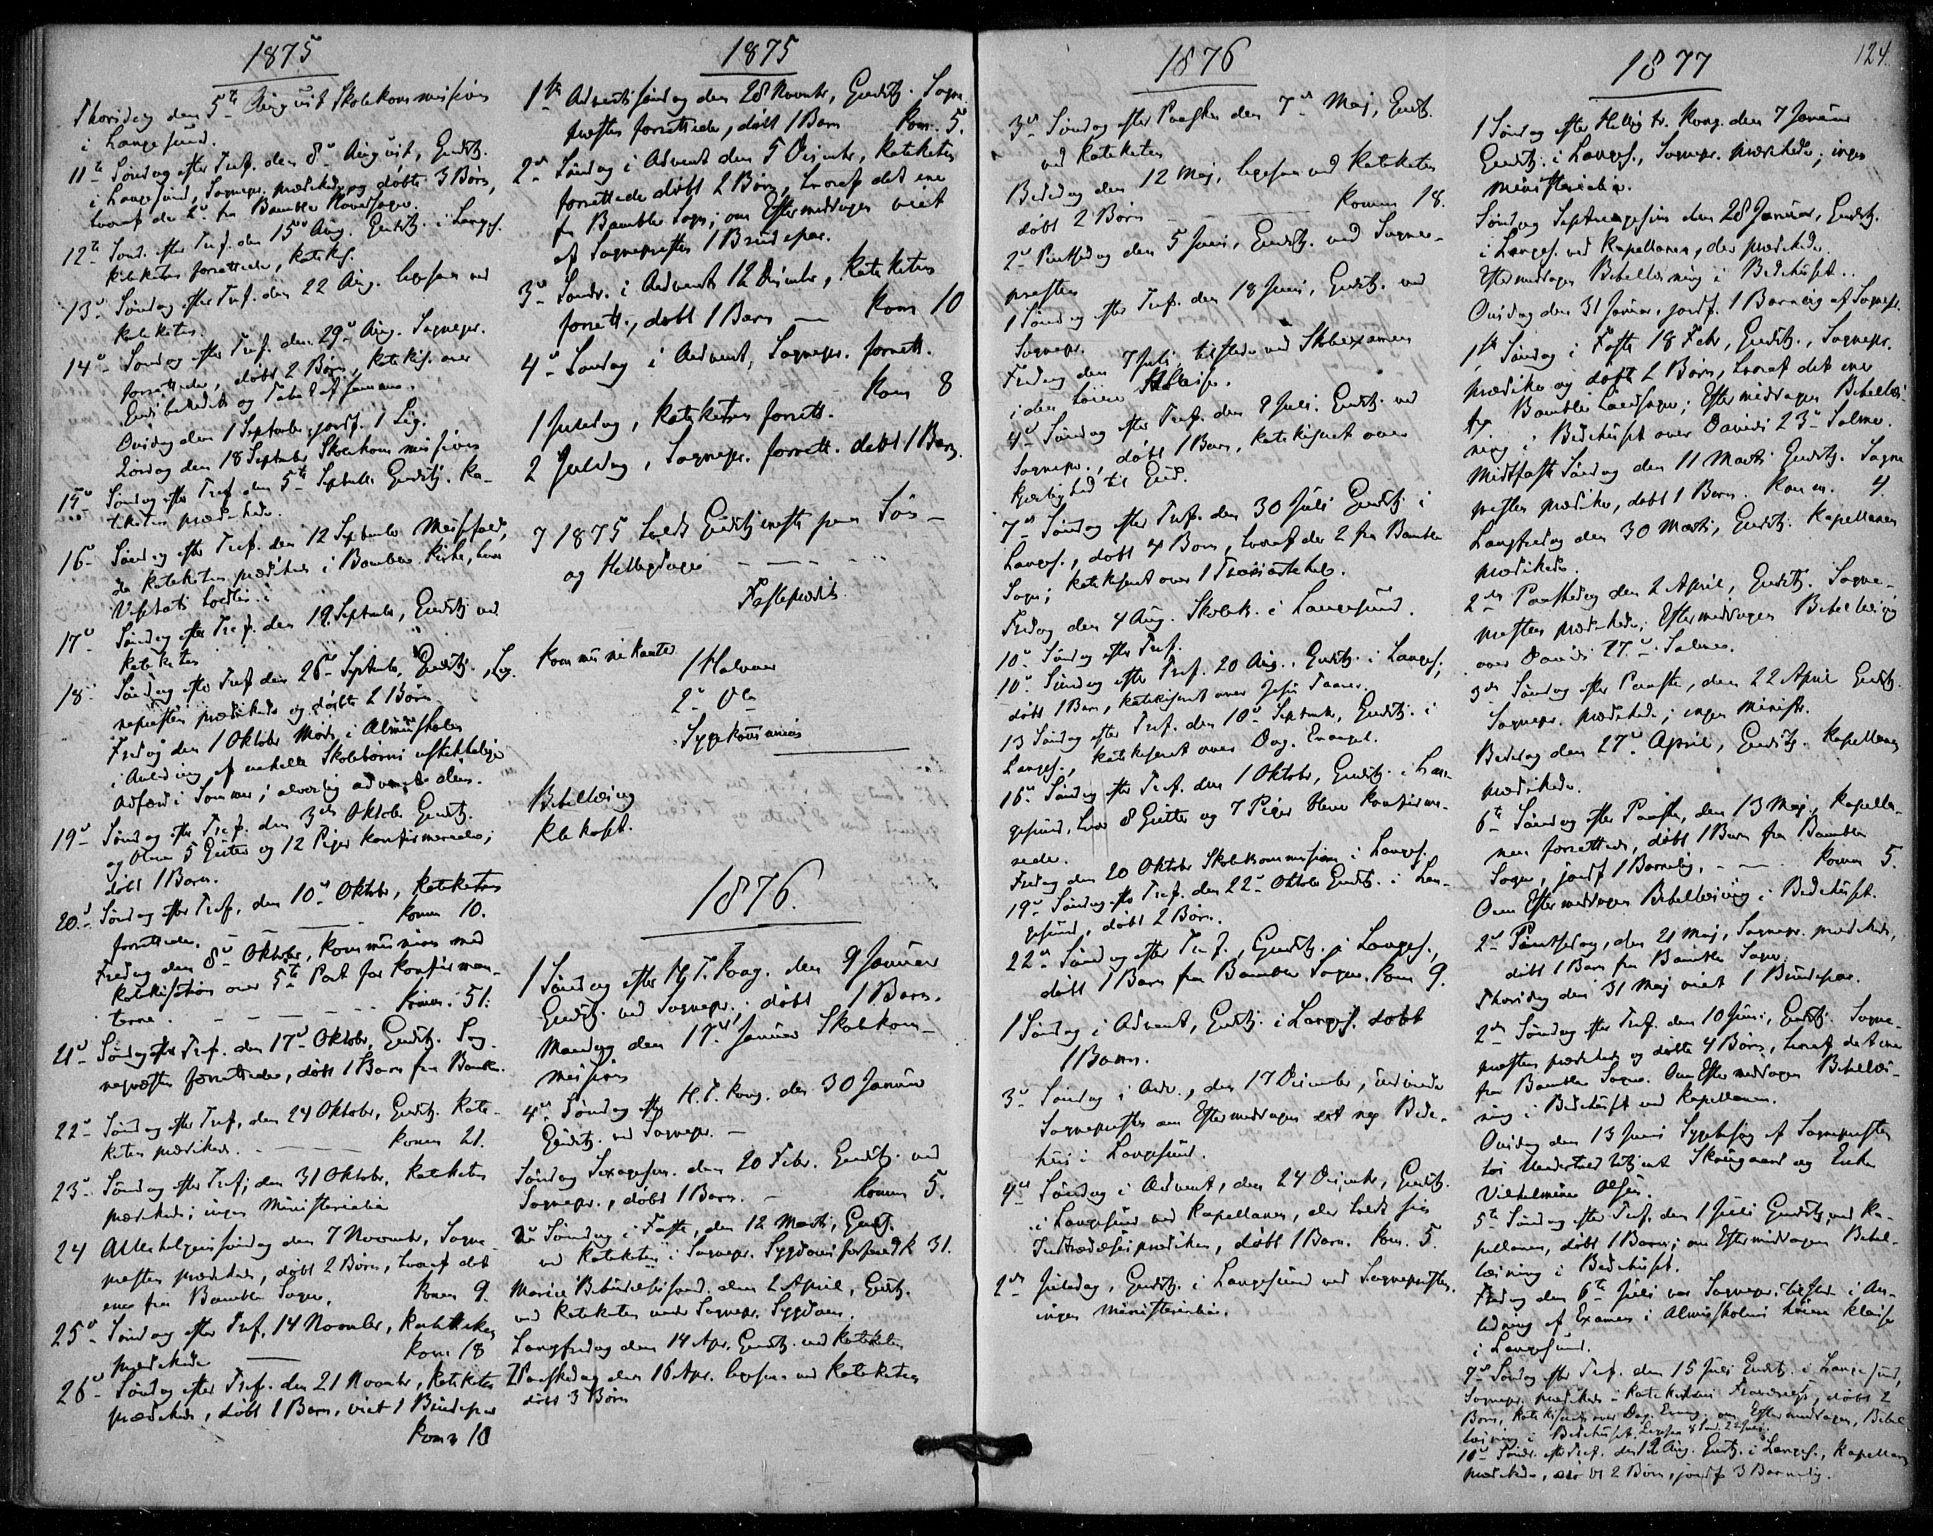 SAKO, Langesund kirkebøker, F/Fa/L0001: Ministerialbok nr. 1, 1870-1877, s. 124